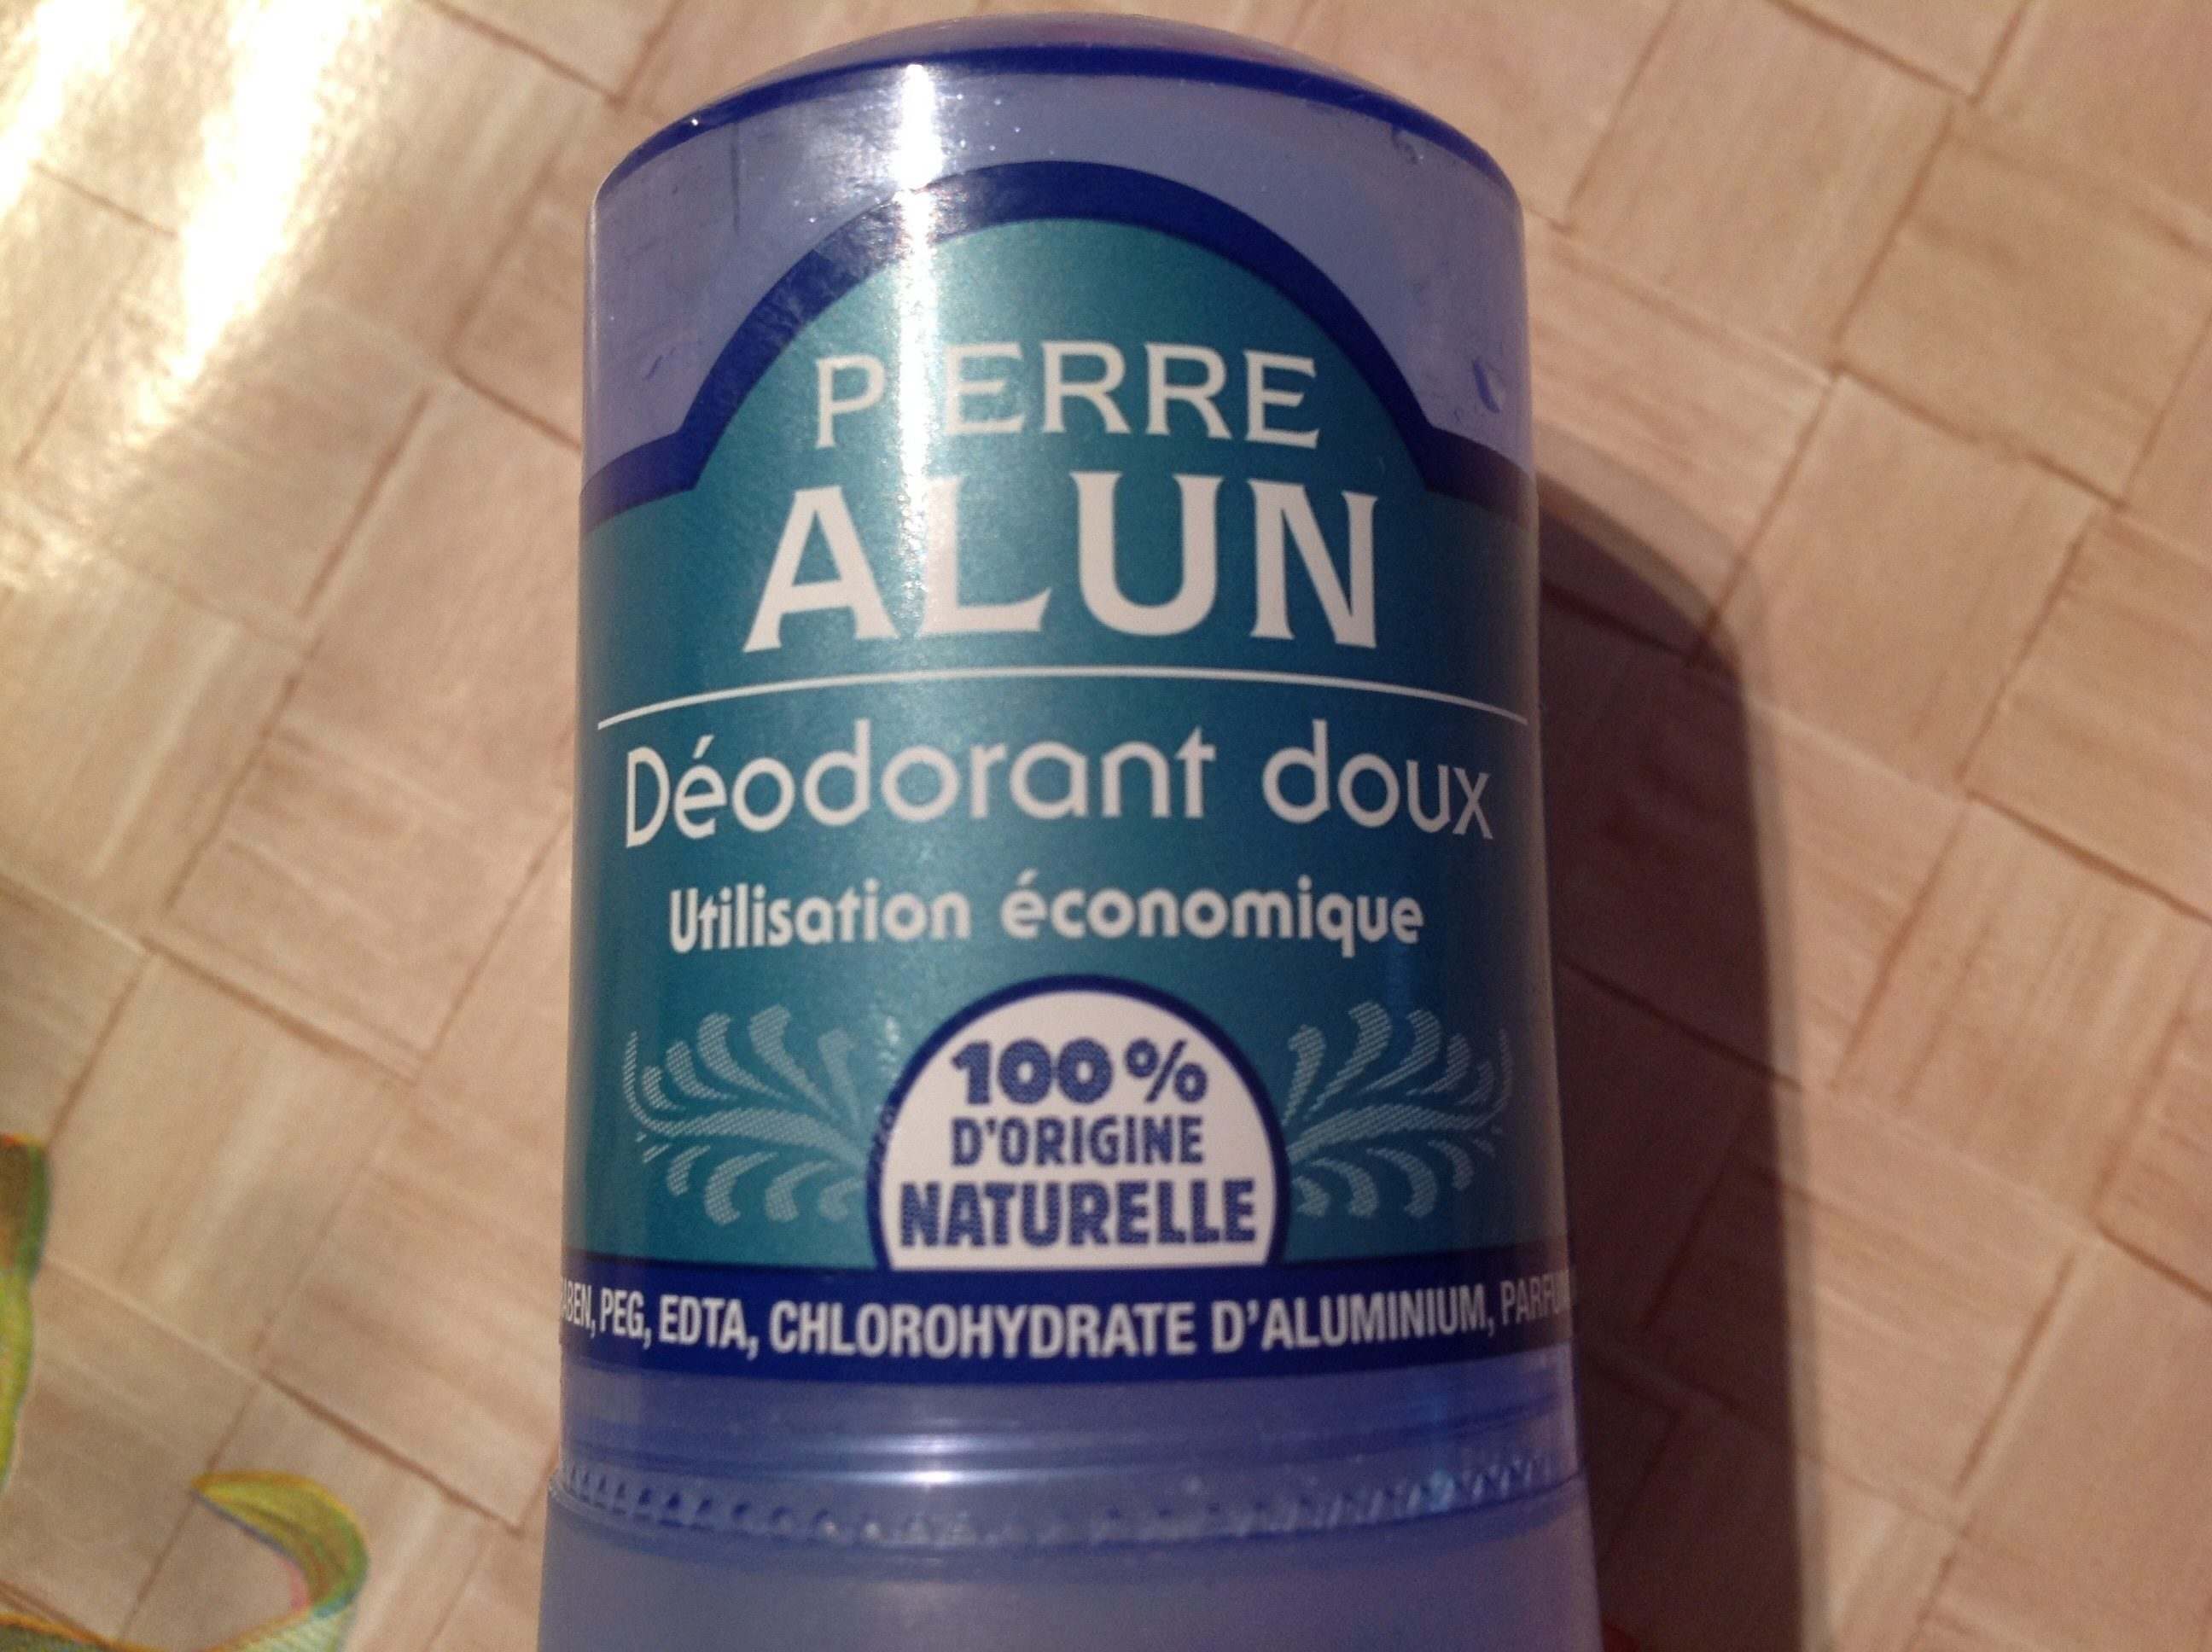 Pierre alun - Product